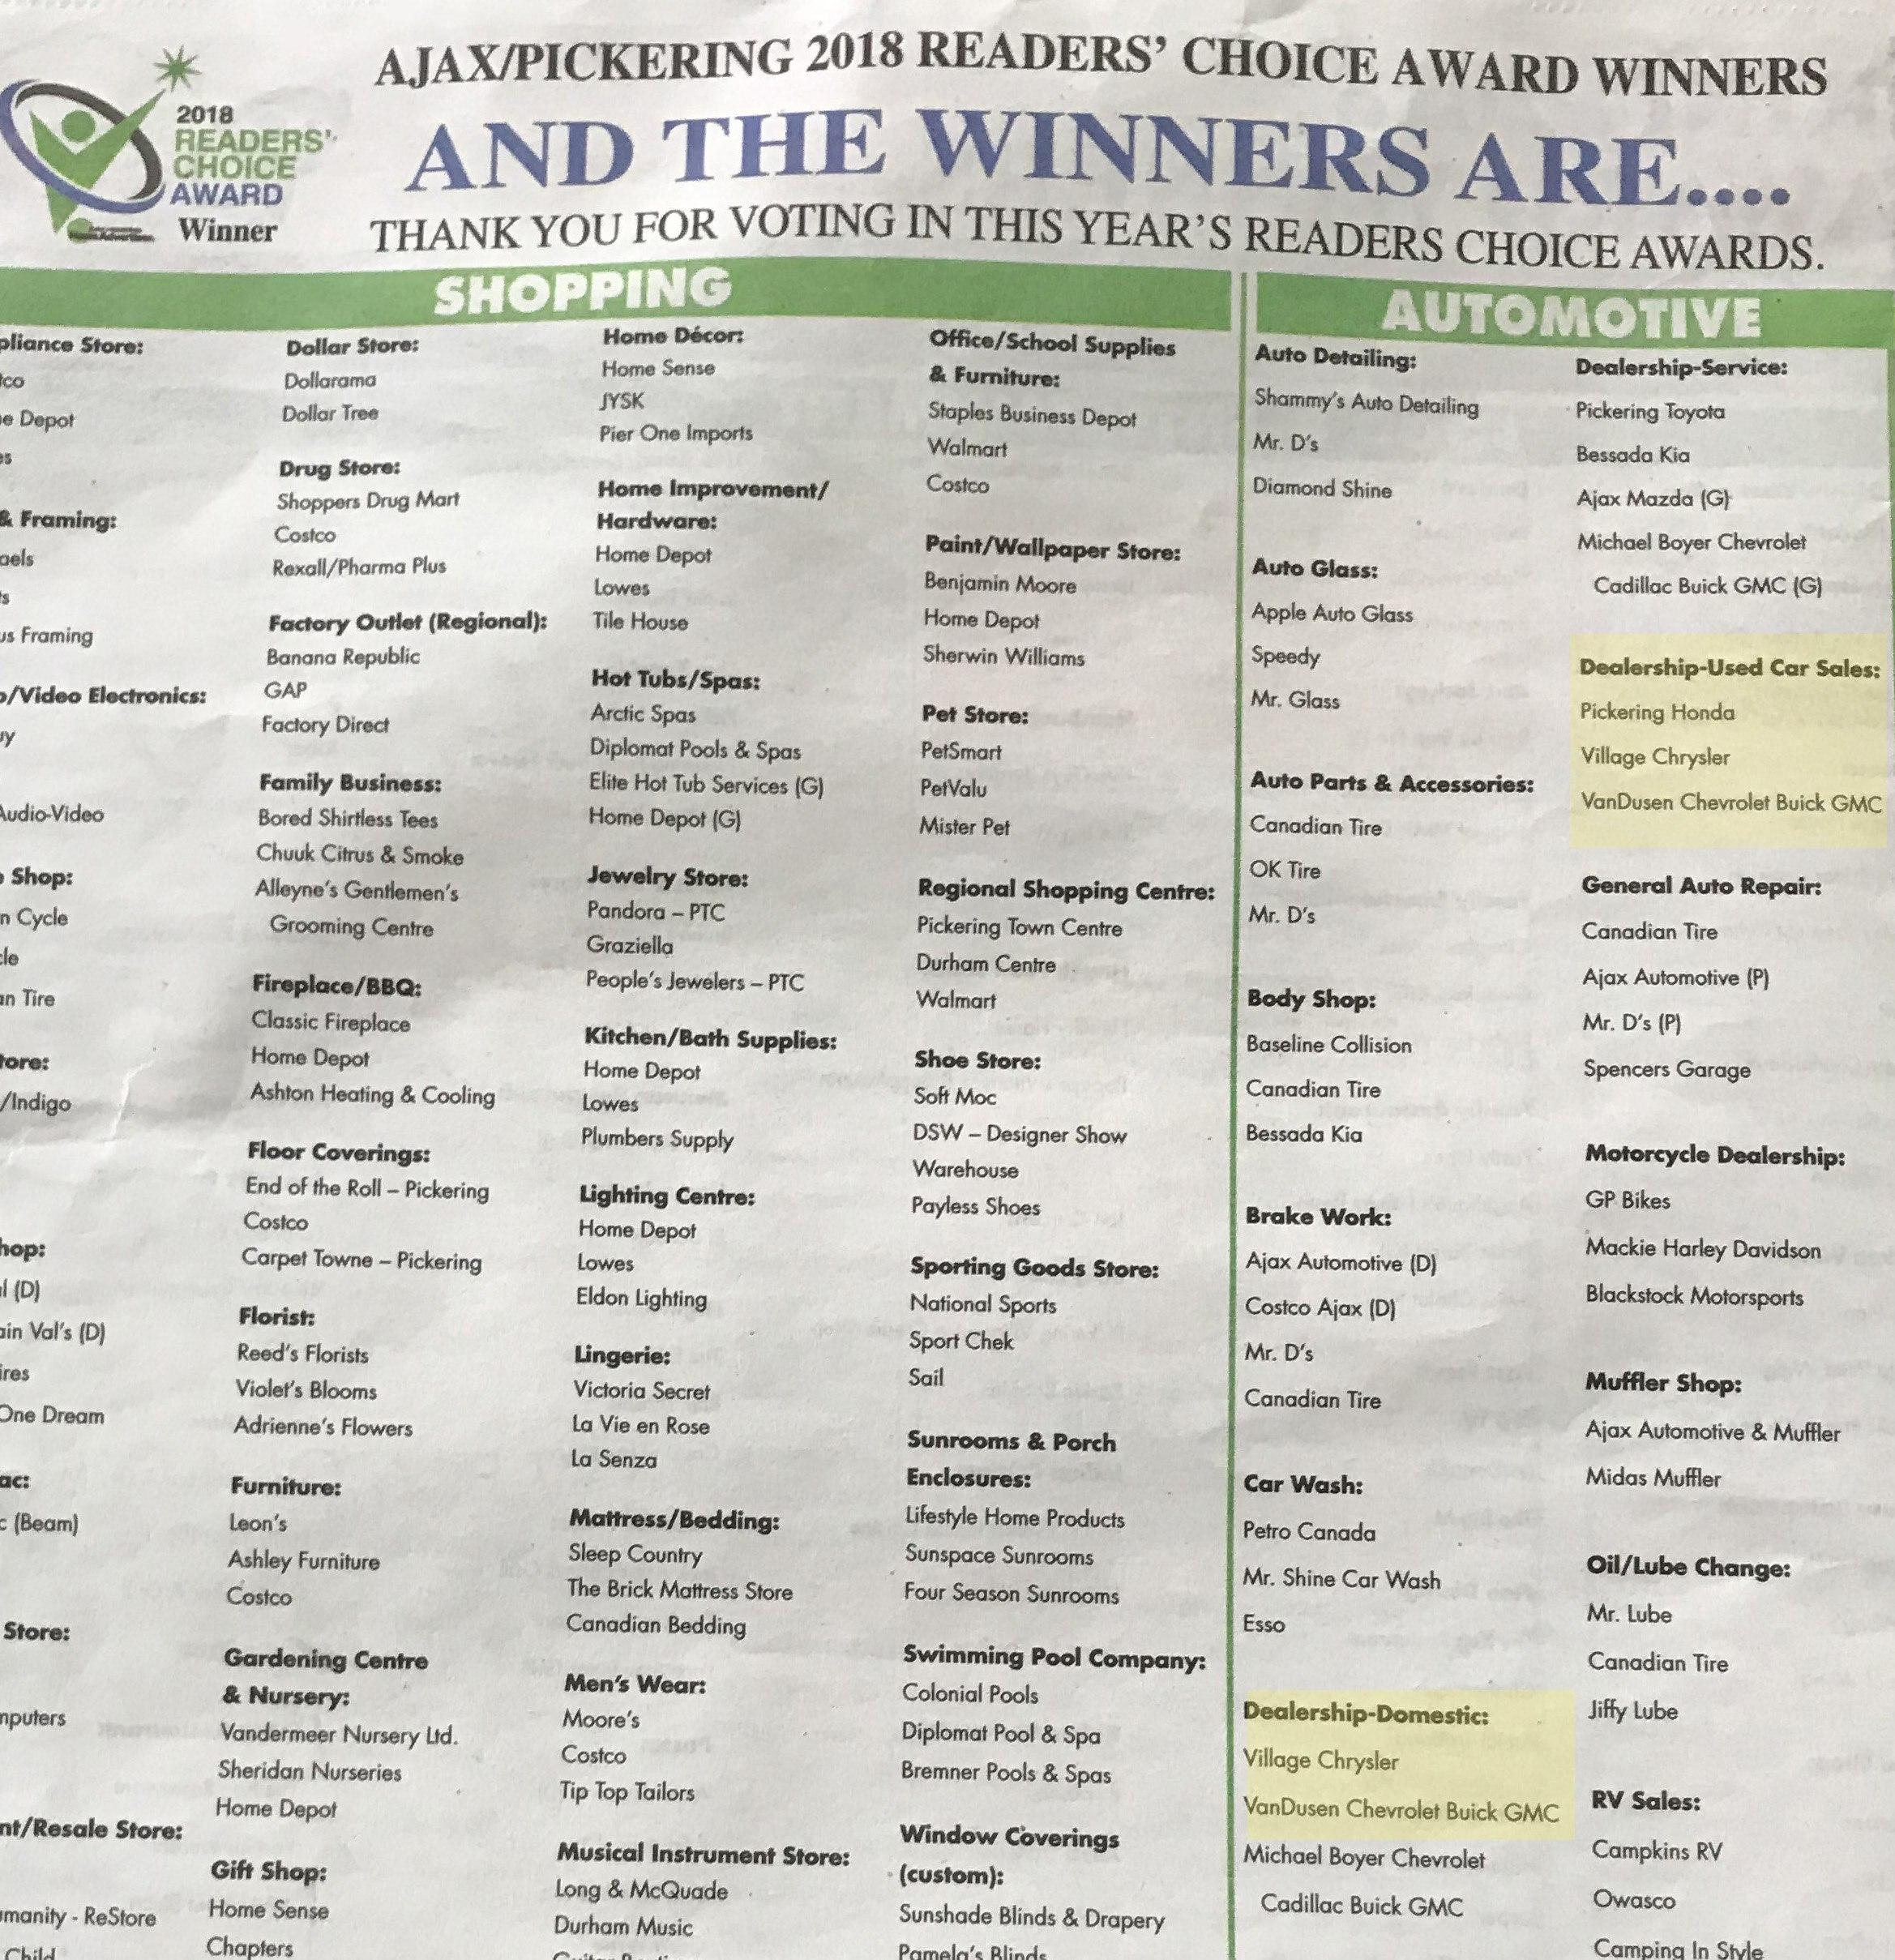 Ajax Pickering 2018 Readers' Choice Award Winners VanDusen Chevrolet Buick GMC Ontario cropped